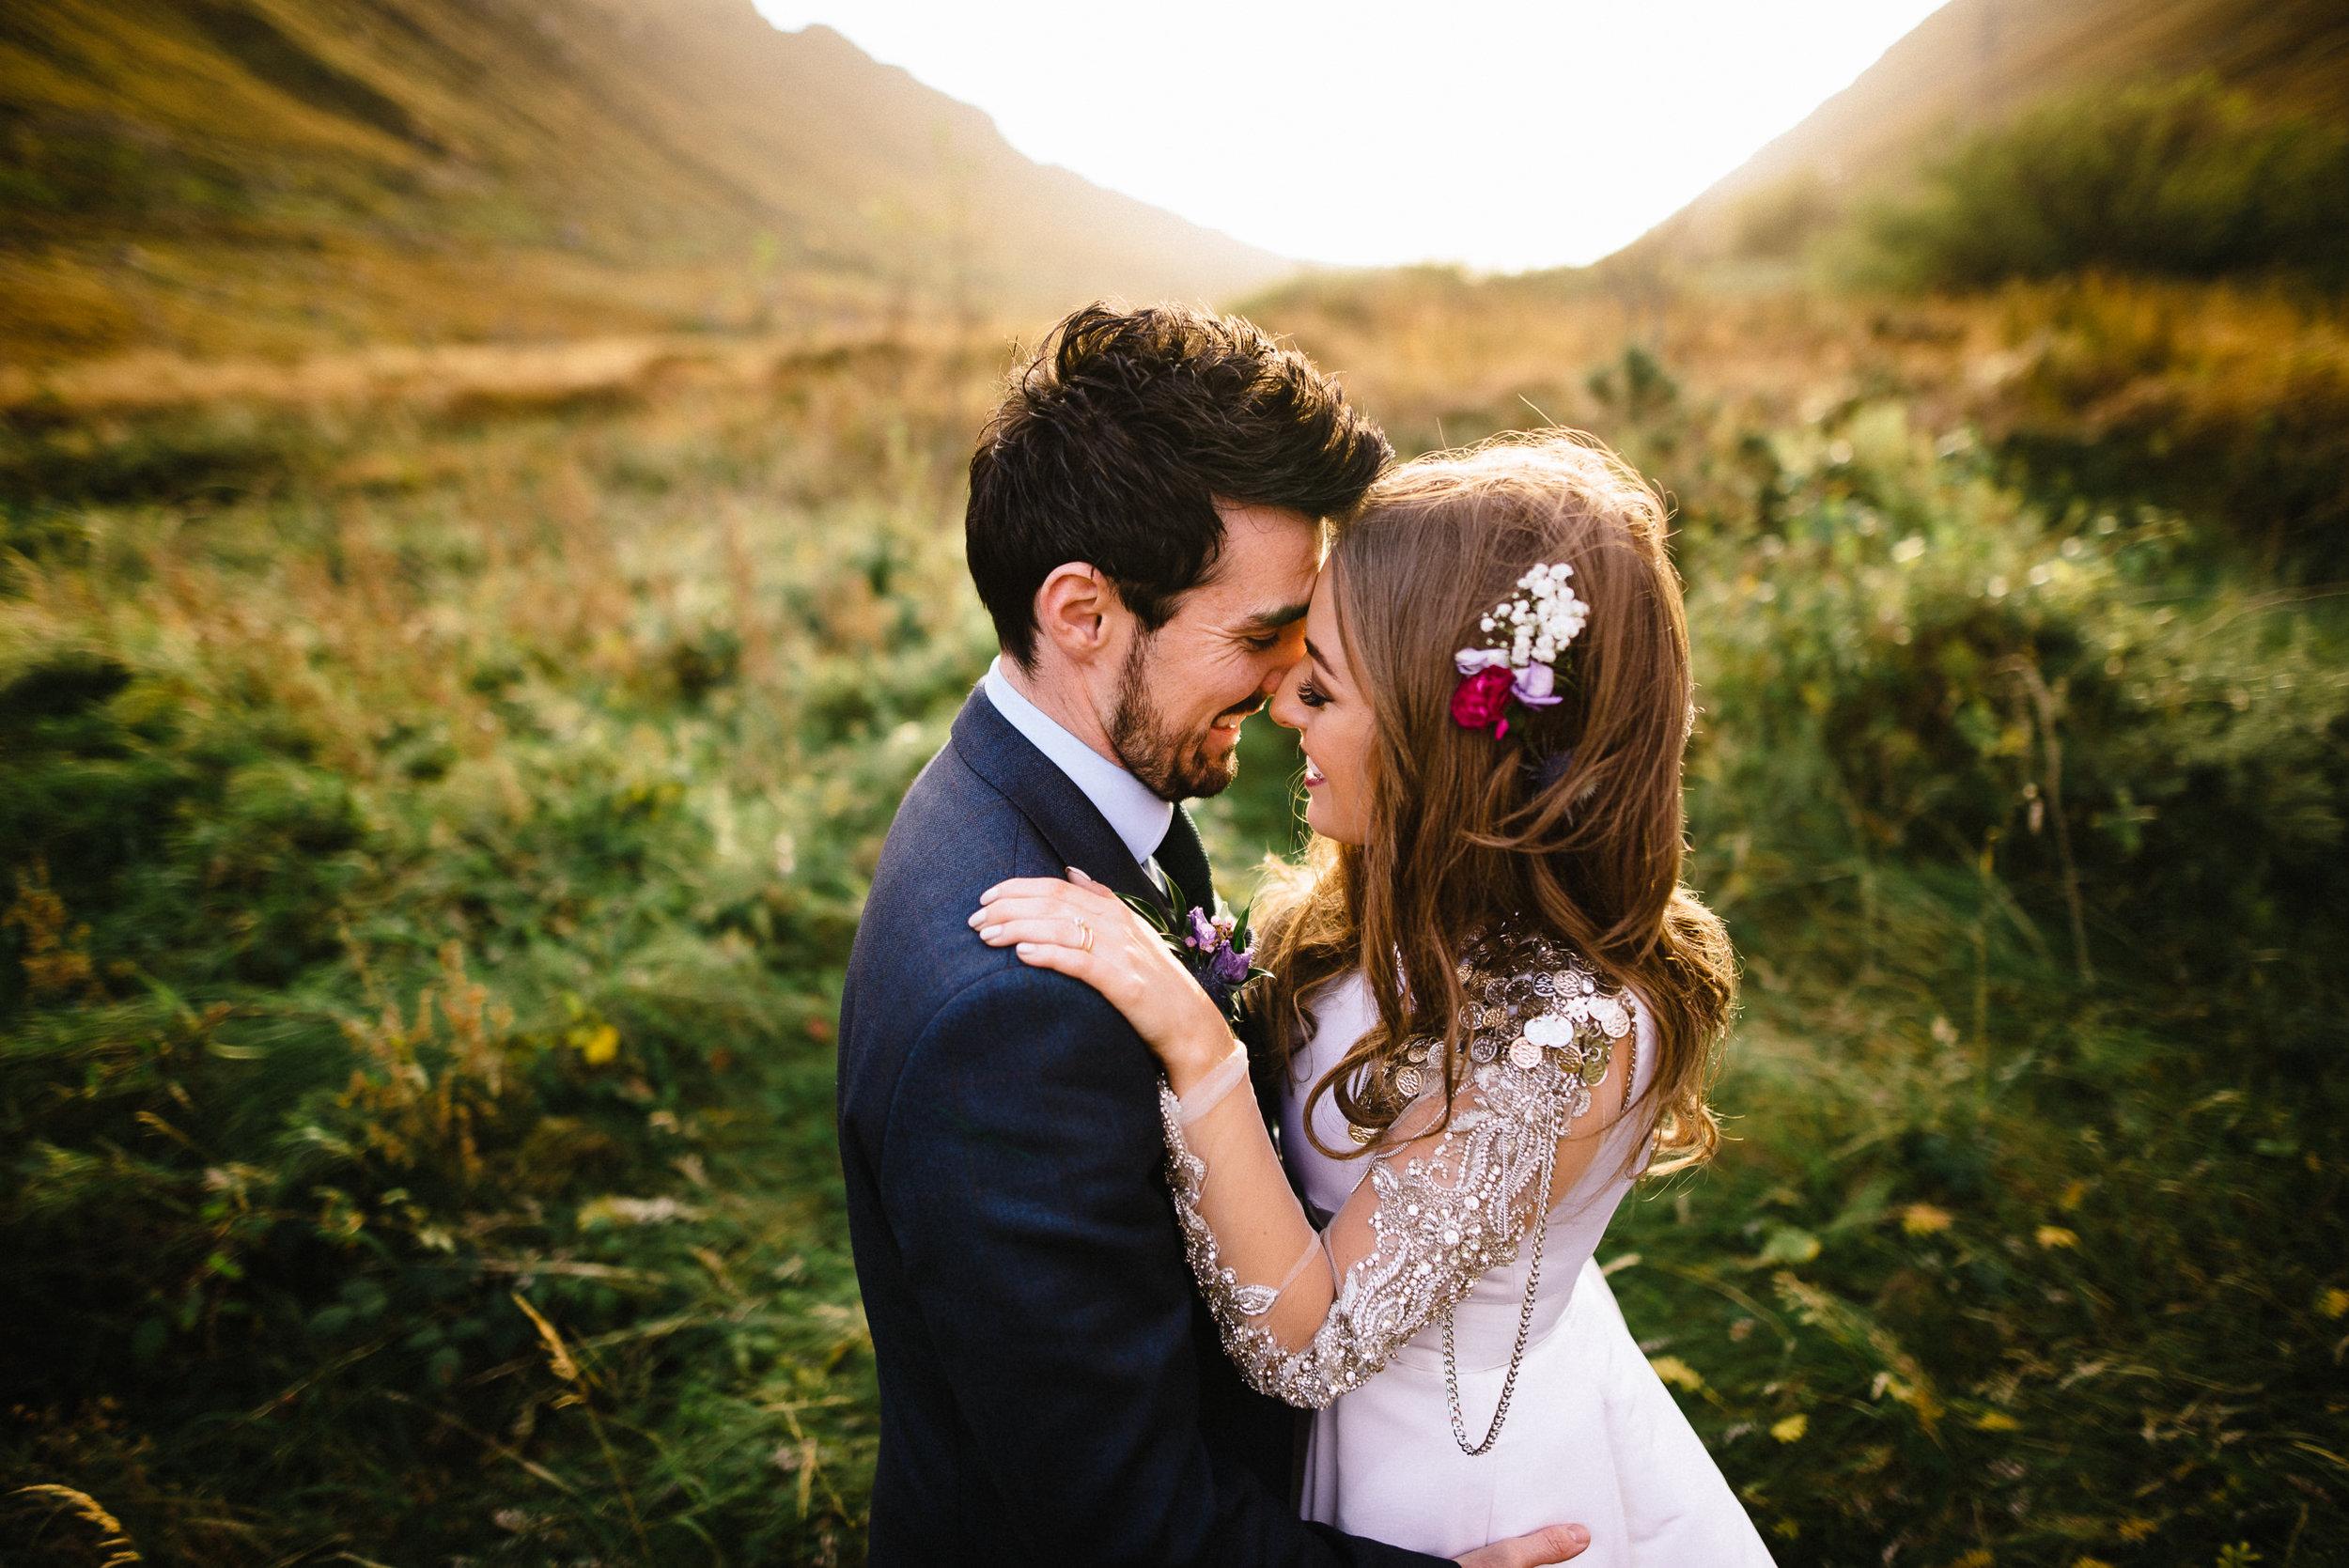 wedding-photography-workshop-epic-love-13.jpg